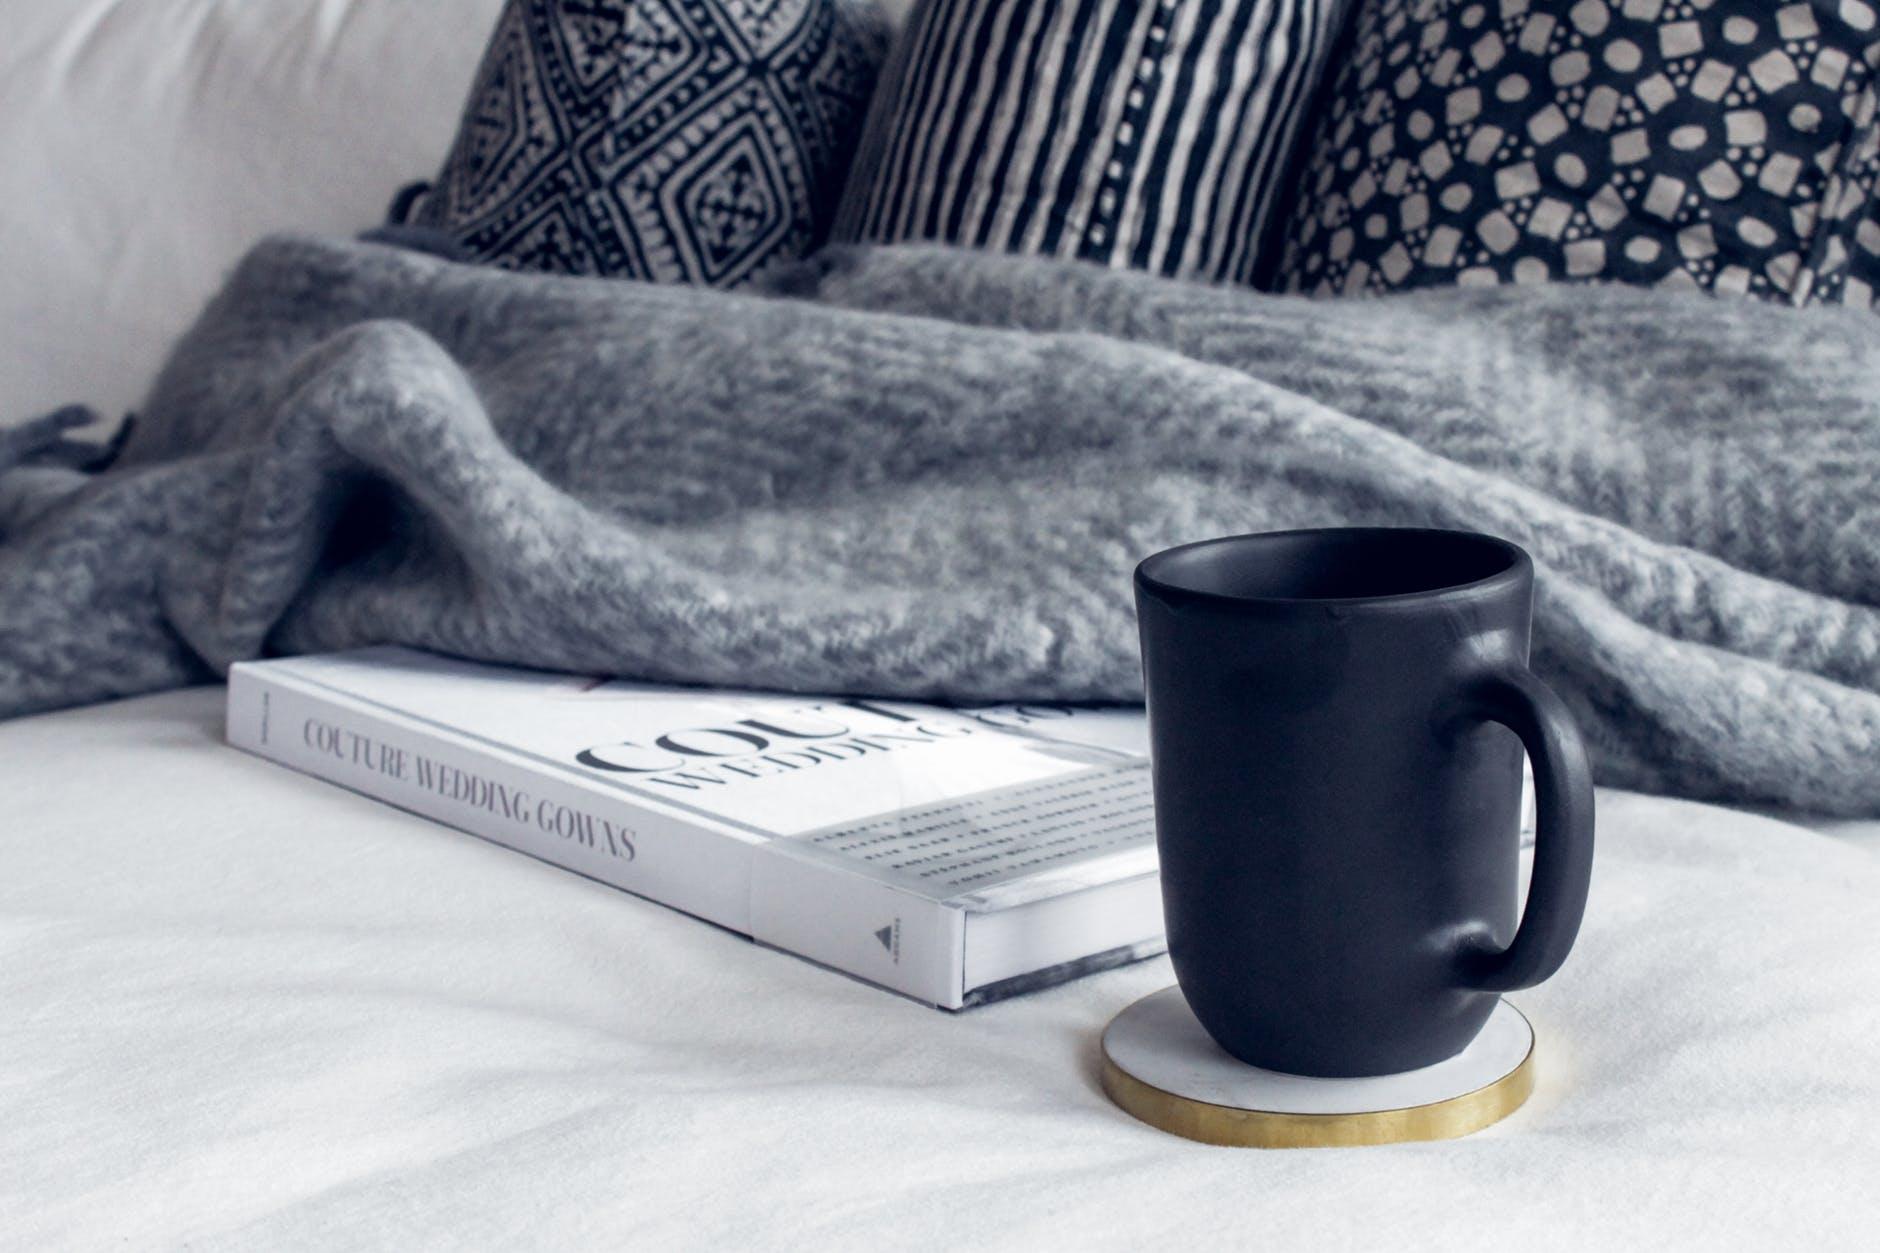 black ceramic mug on round white and beige coaster on white textile beside book